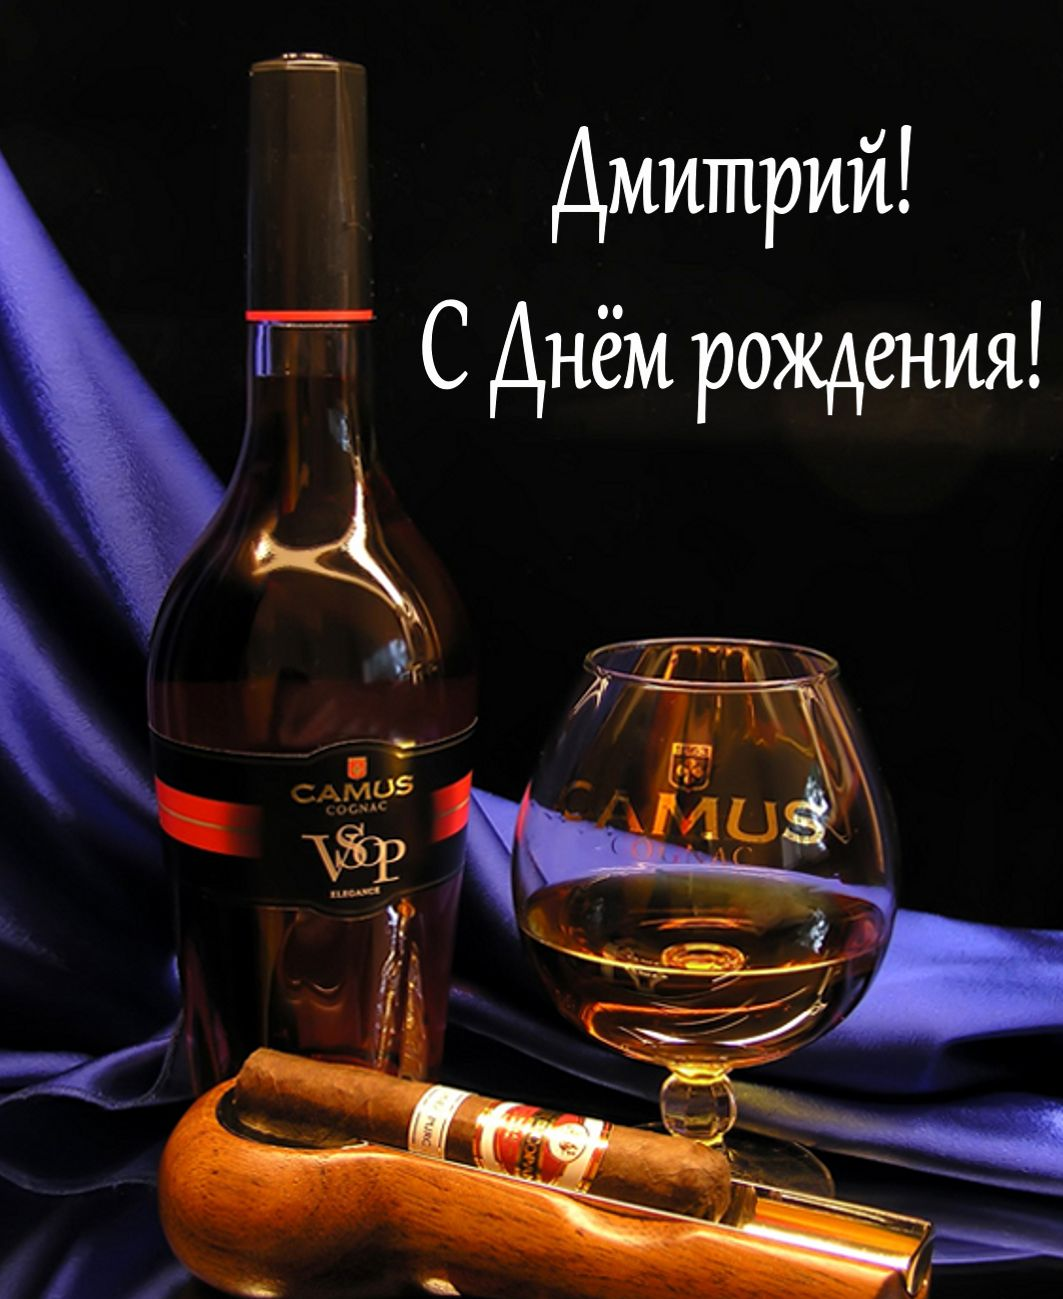 Открытки, открытка с юбилеем дмитрий николаевич